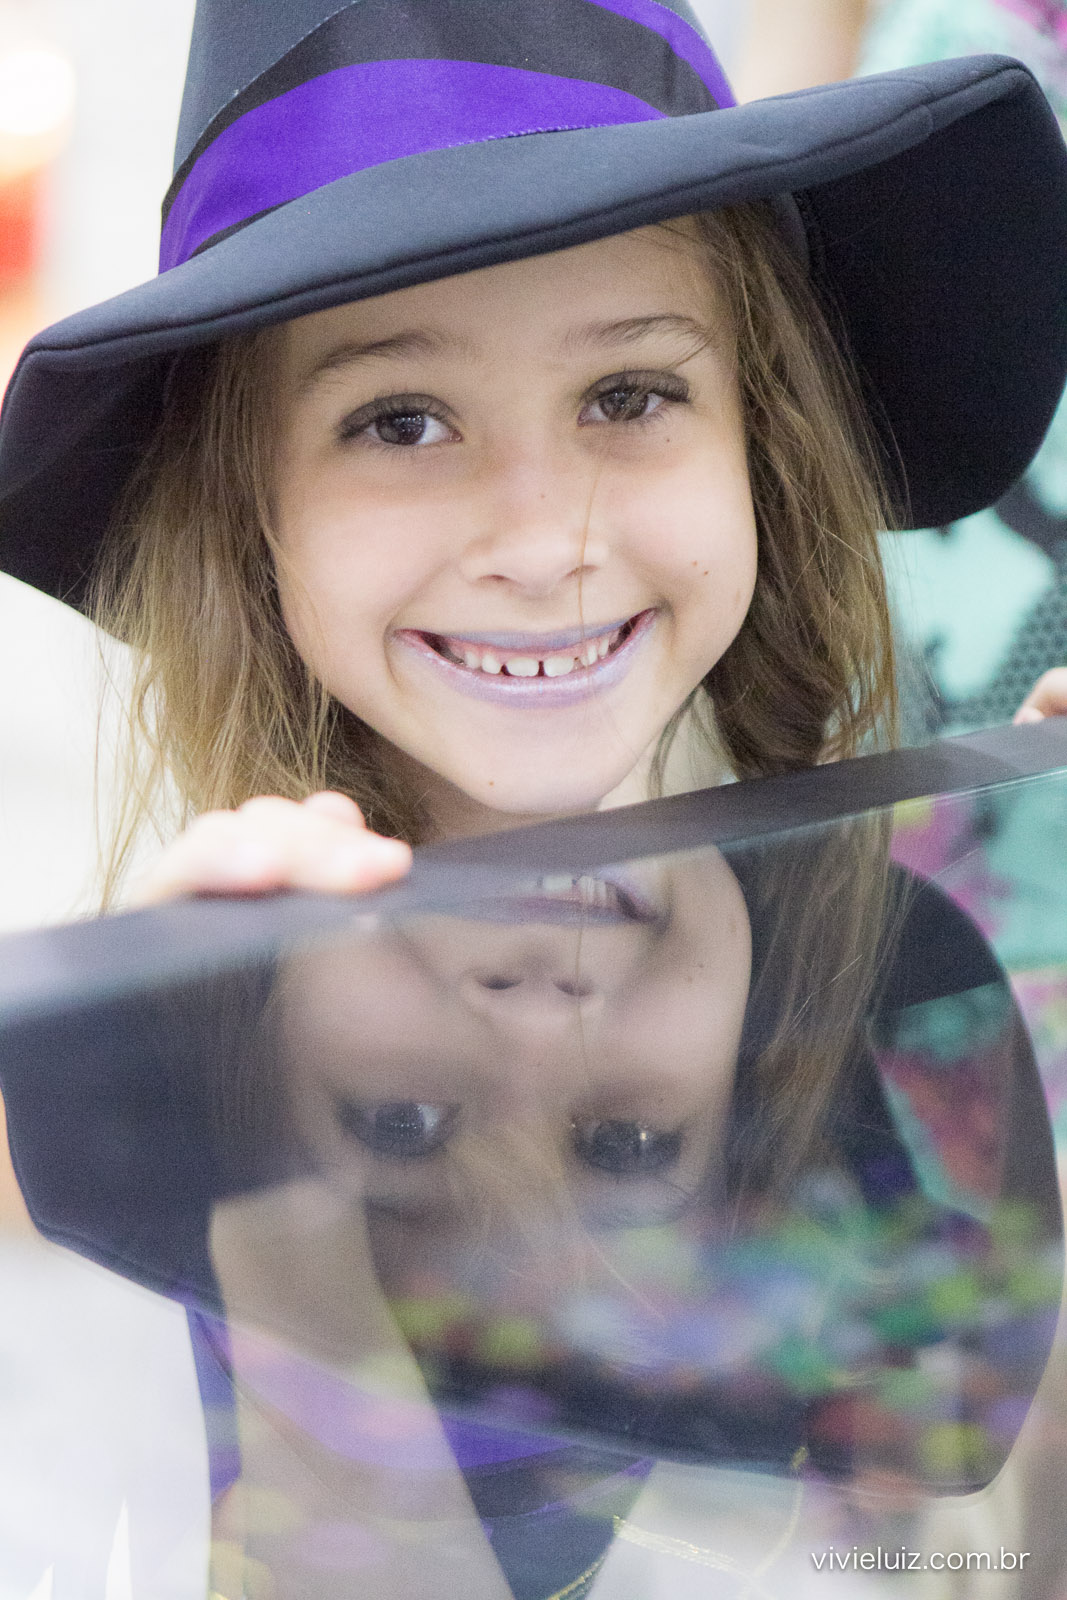 luisa com lindo sorriso e seu reflexo na mesa